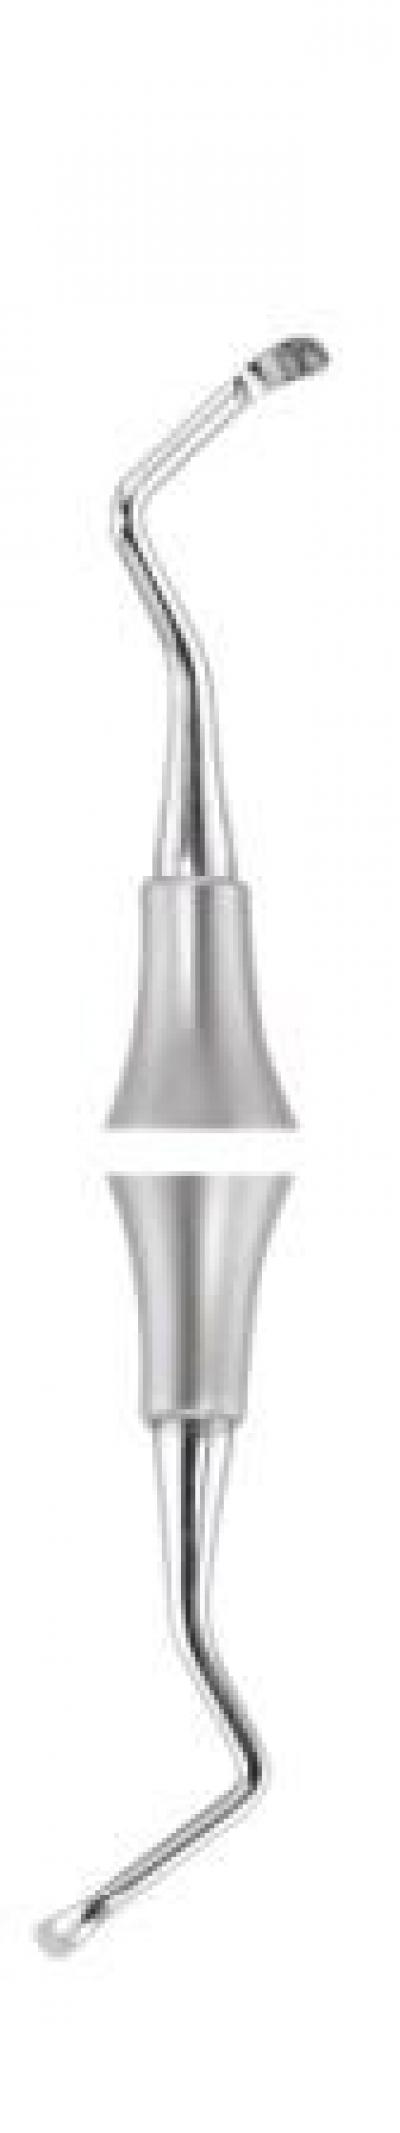 Sinus Lift  ( IMPSL6 )-Sinus Lift Instruments